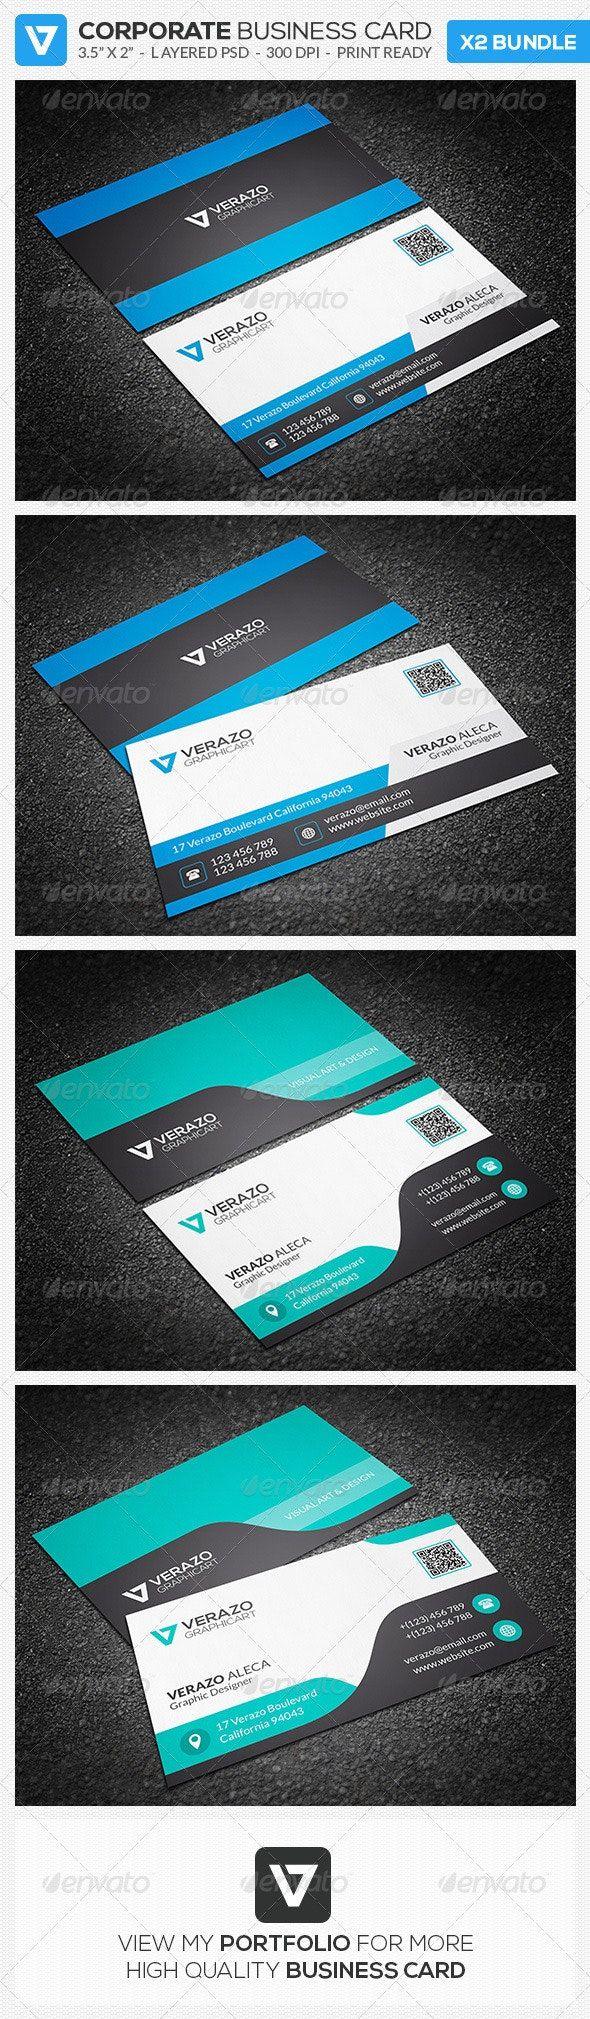 Business Card Bundle 01 Business Card Design Minimal Business Cards Creative Buy Business Cards